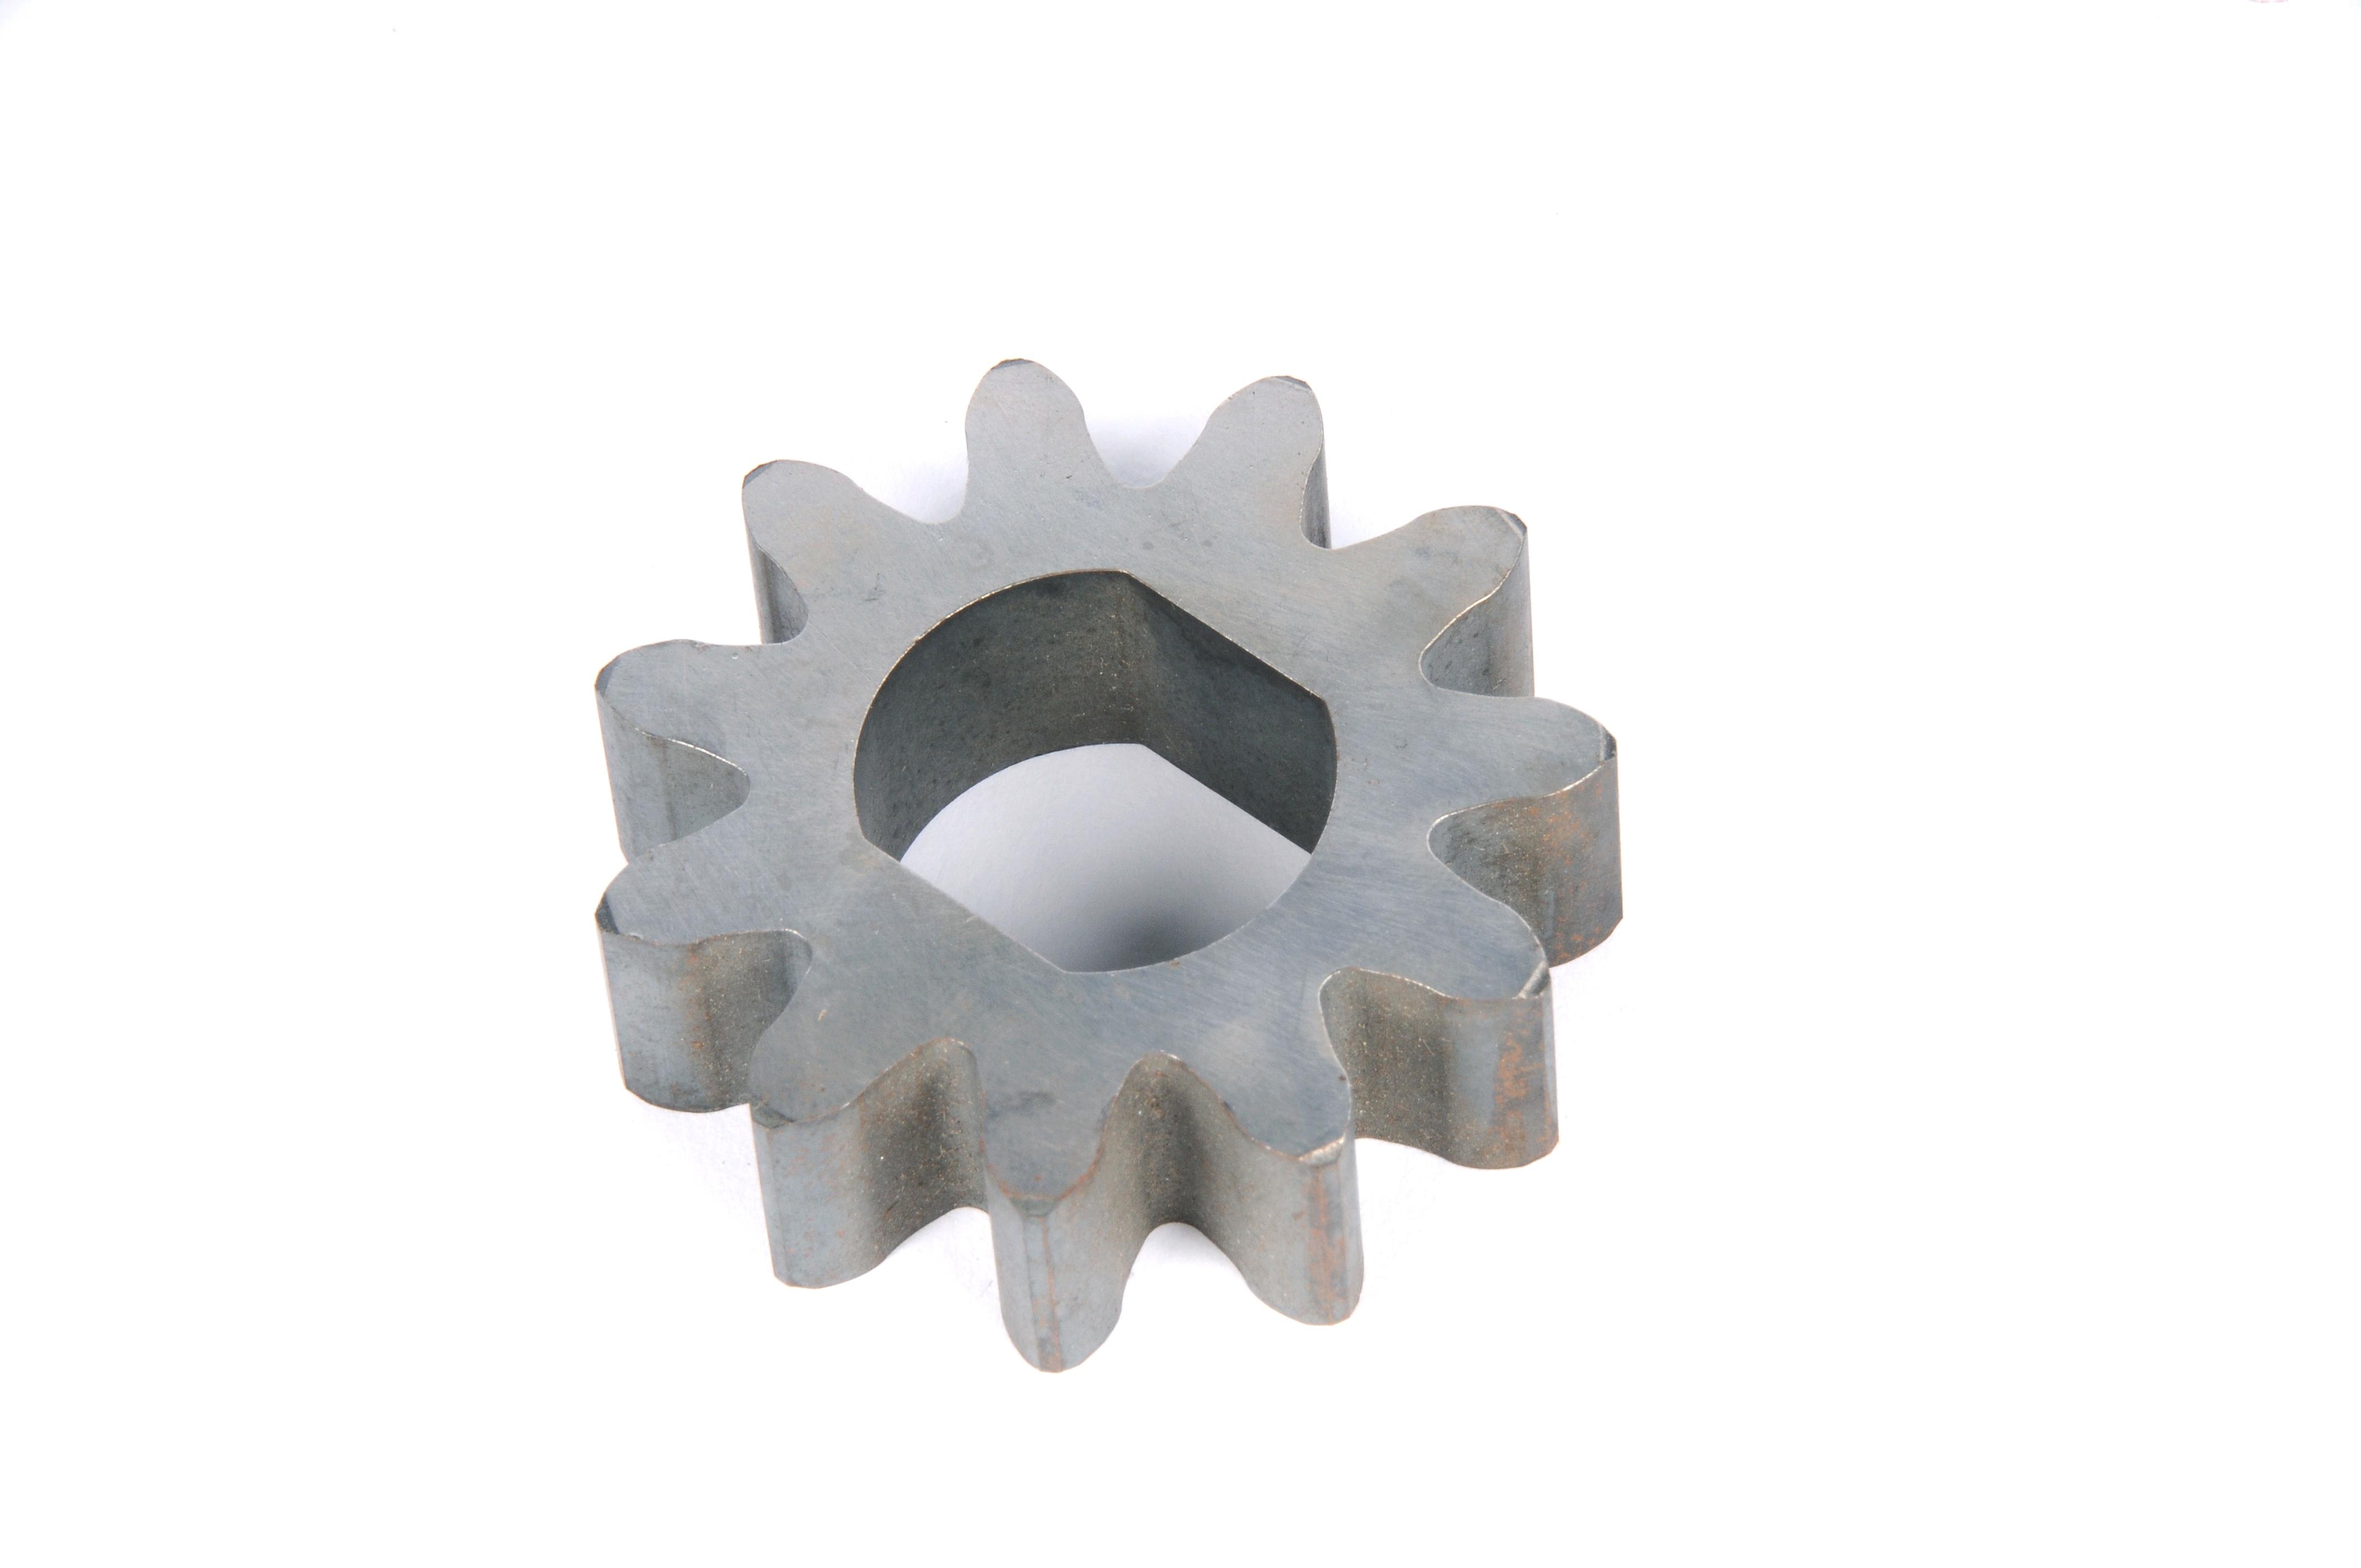 ACDELCO OE SERVICE - A/T Transfer Fluid Pump Drive Gear - DCB 08683724